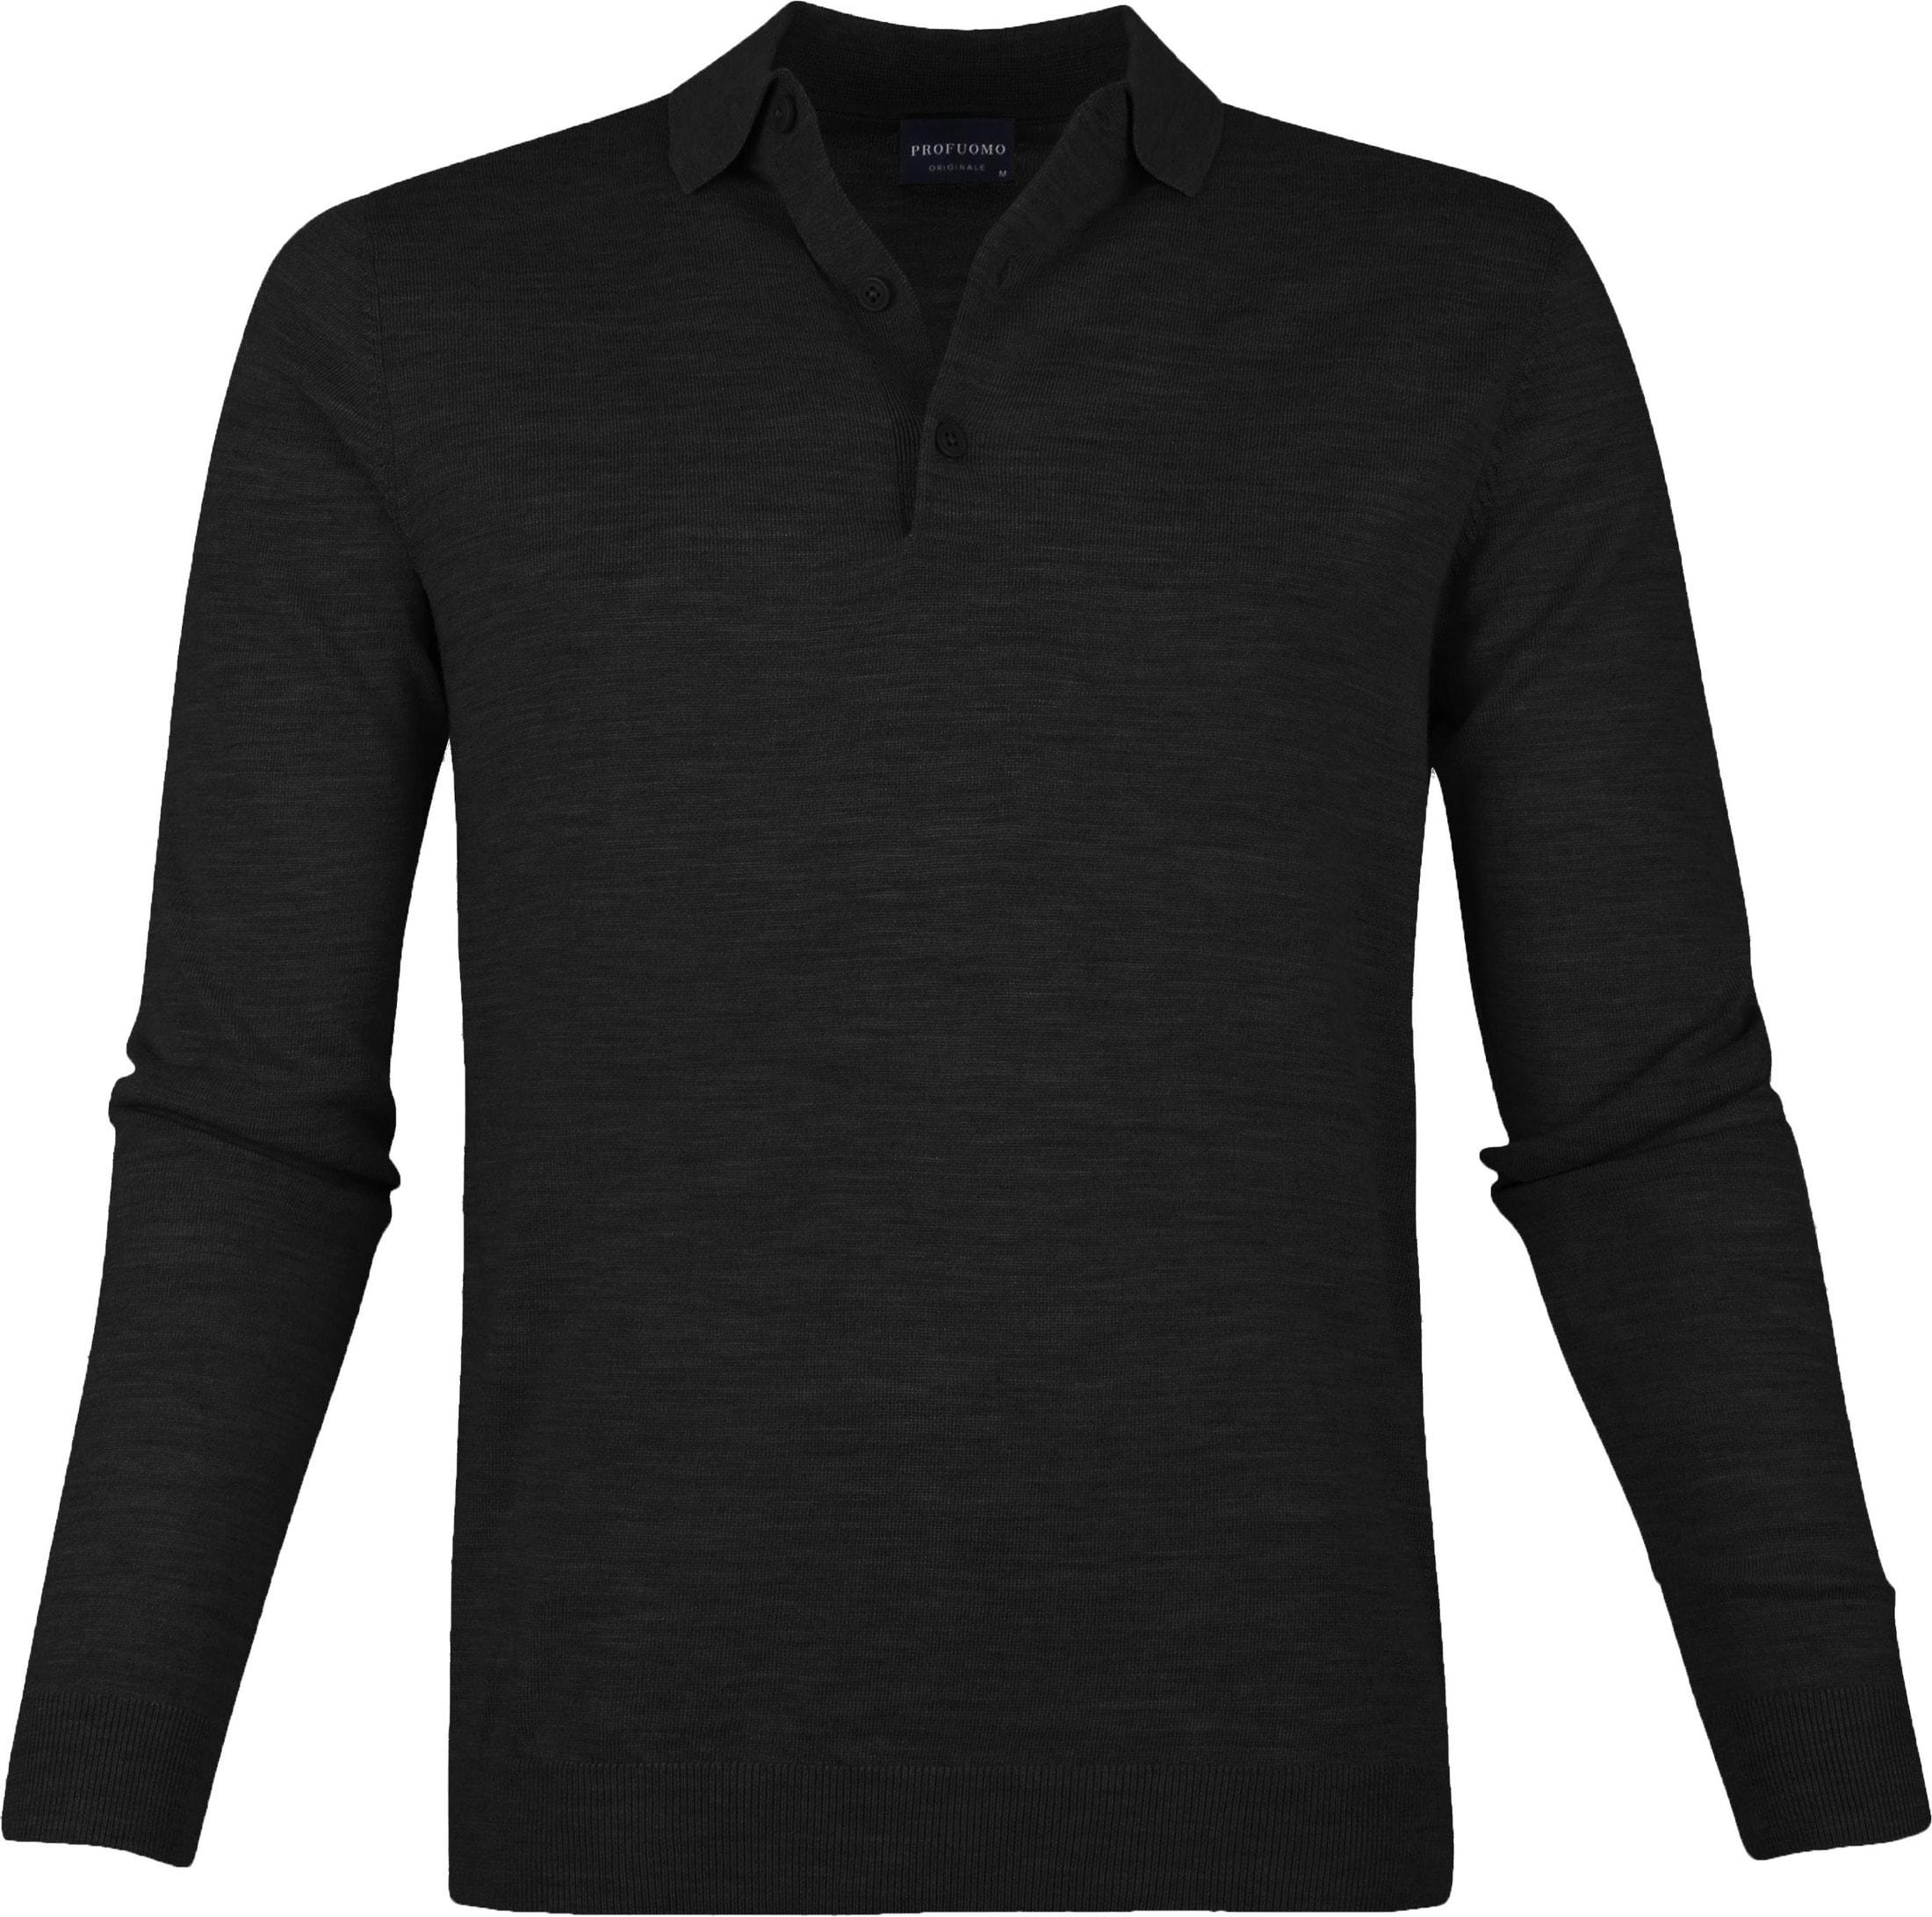 Profuomo Merino Poloshirt Black foto 0